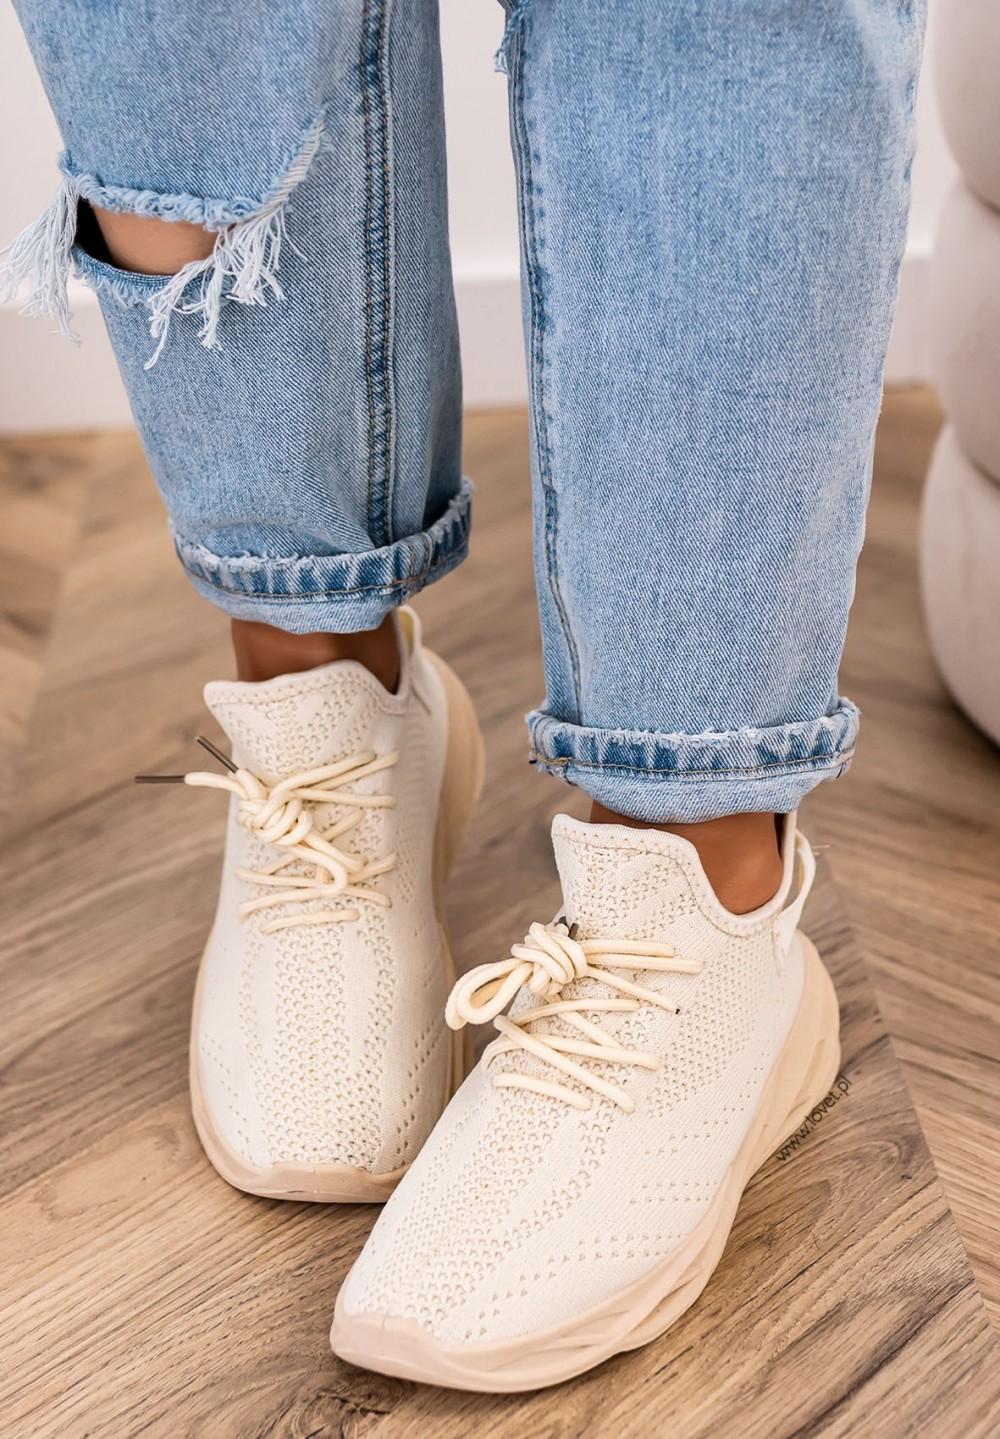 Trampki Sneakersy Siateczkowe Beżowe Felise